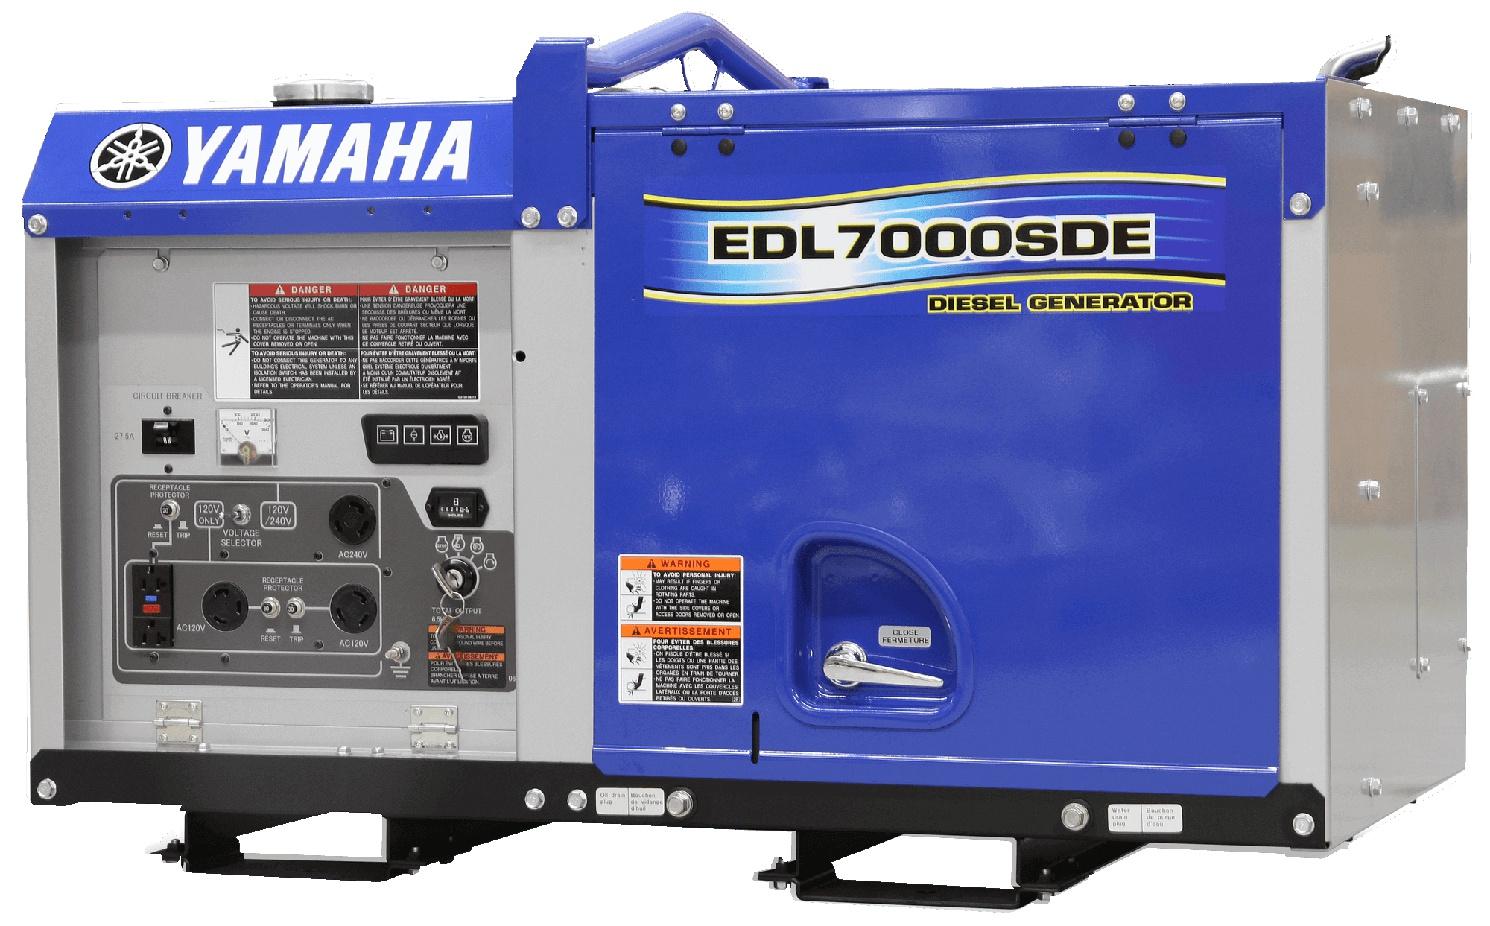 Yamaha Diesel EDL7000SDE